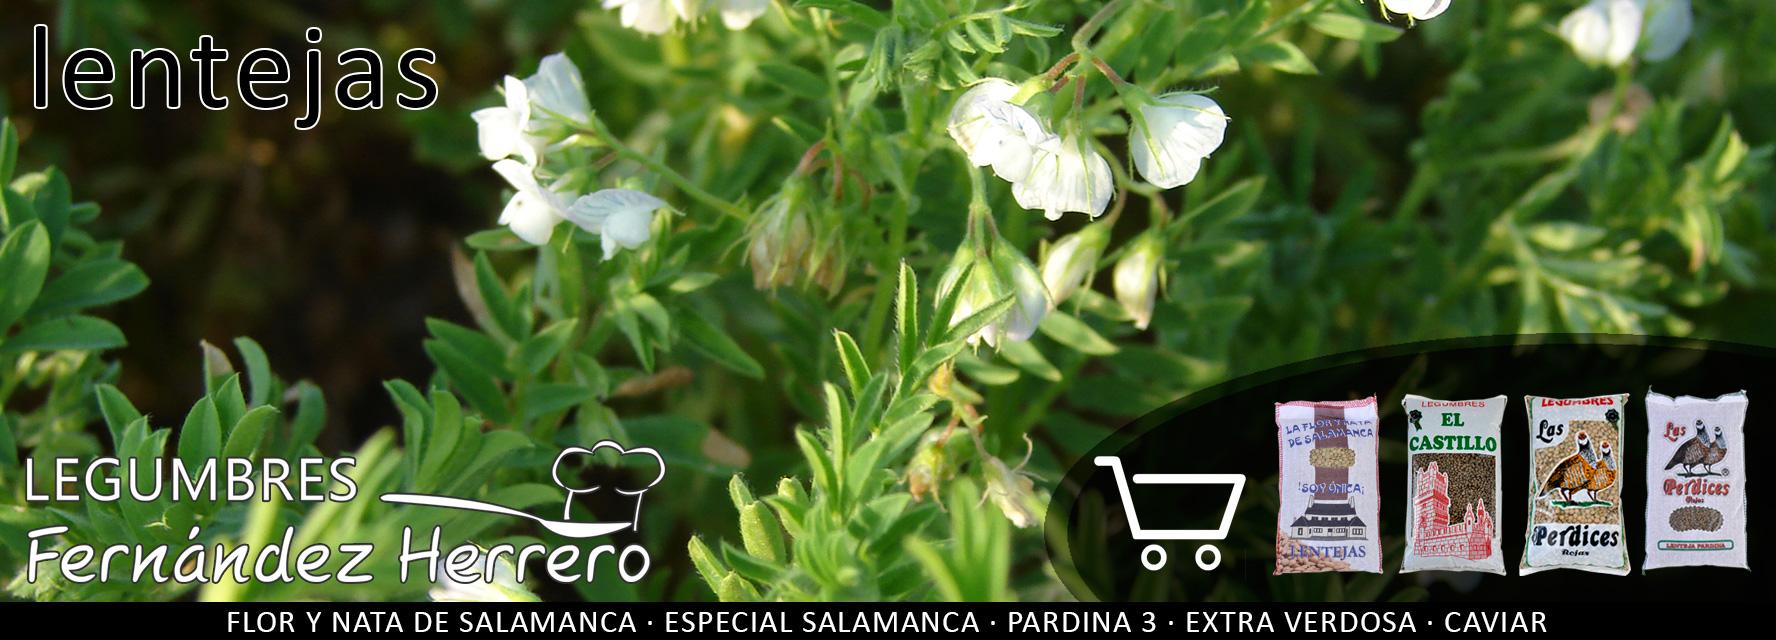 Lentejas: Lentajas de la Armuña, caviar, Salamanca, castellana, rubia, pardina, pelada amarilla, pelada roja